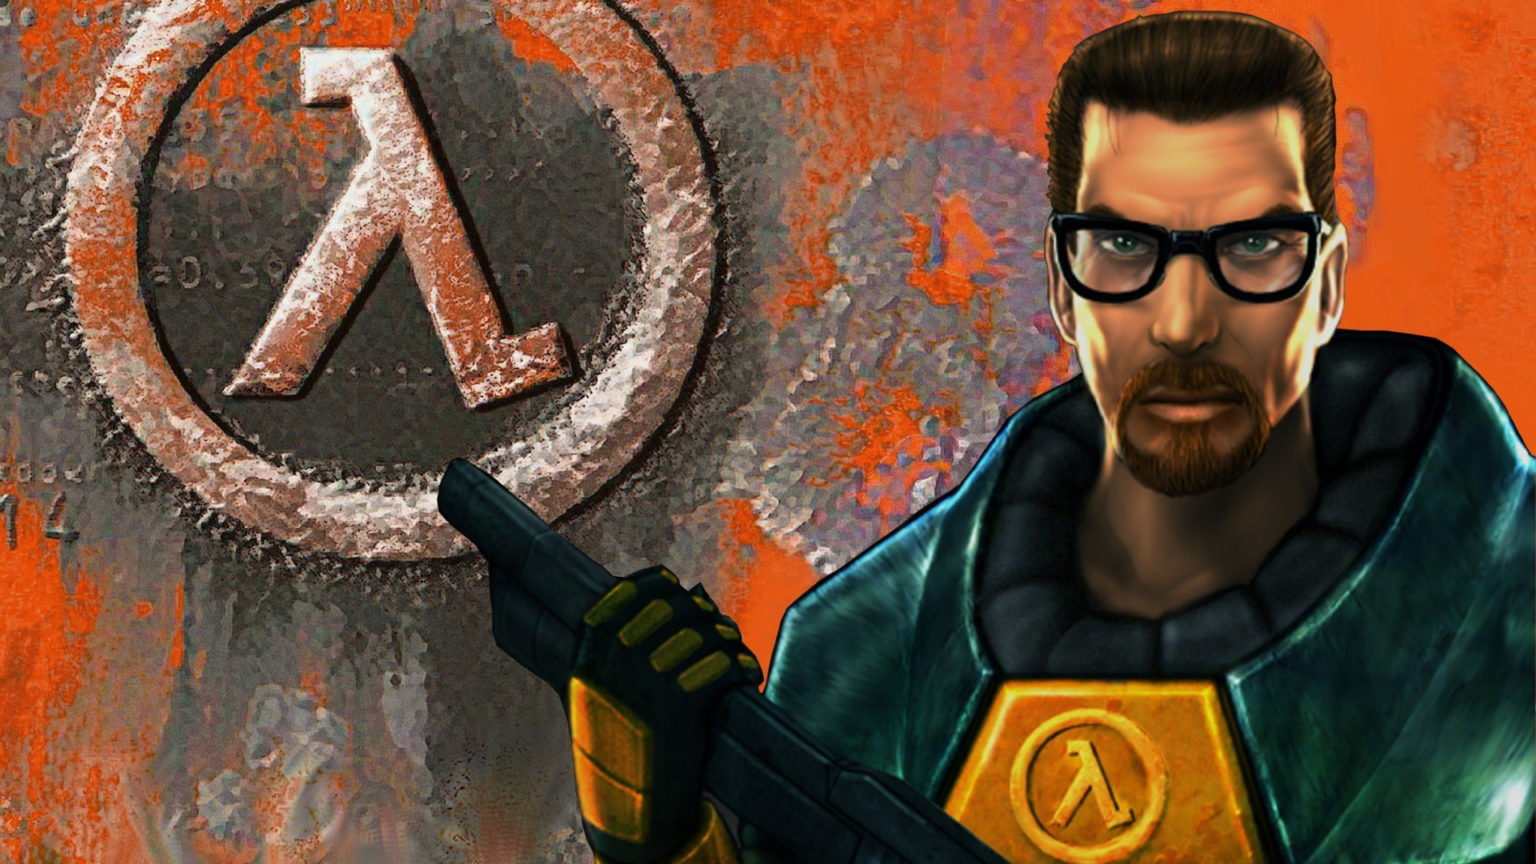 Half-Life 1 & 2